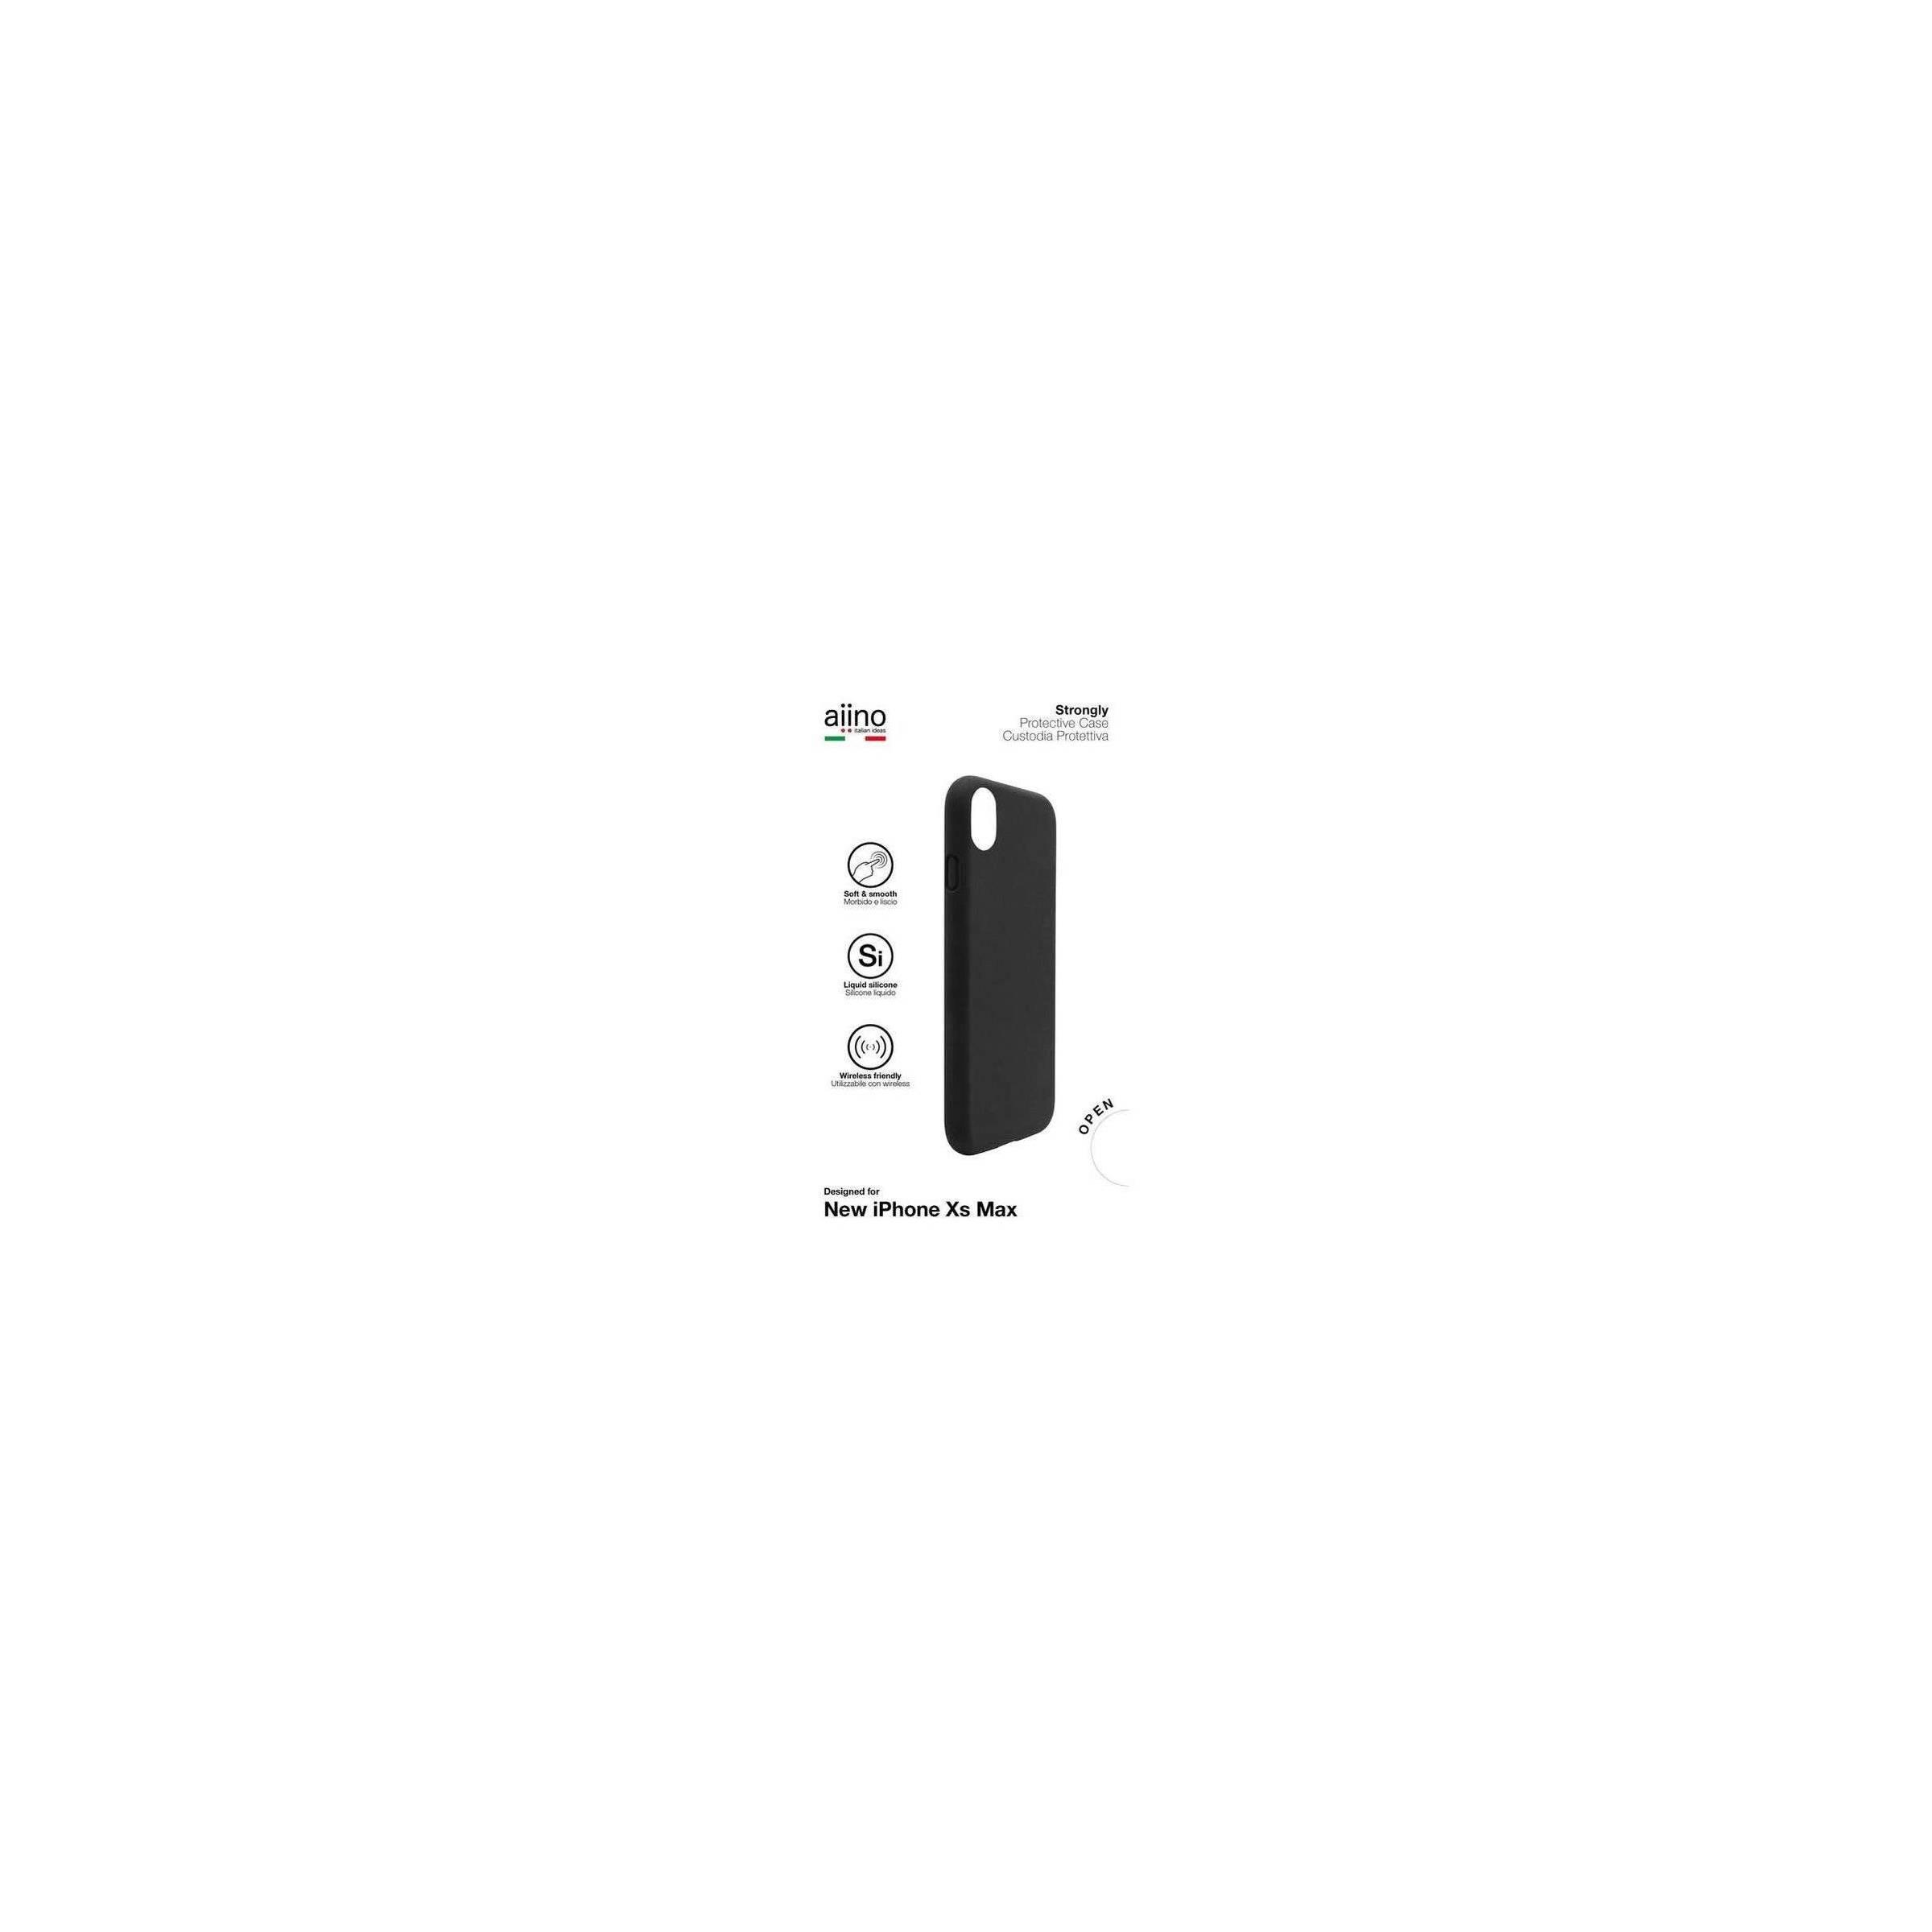 aiino Aiino strongly premium cover til iphone xs max sort/blå farve sort fra mackabler.dk